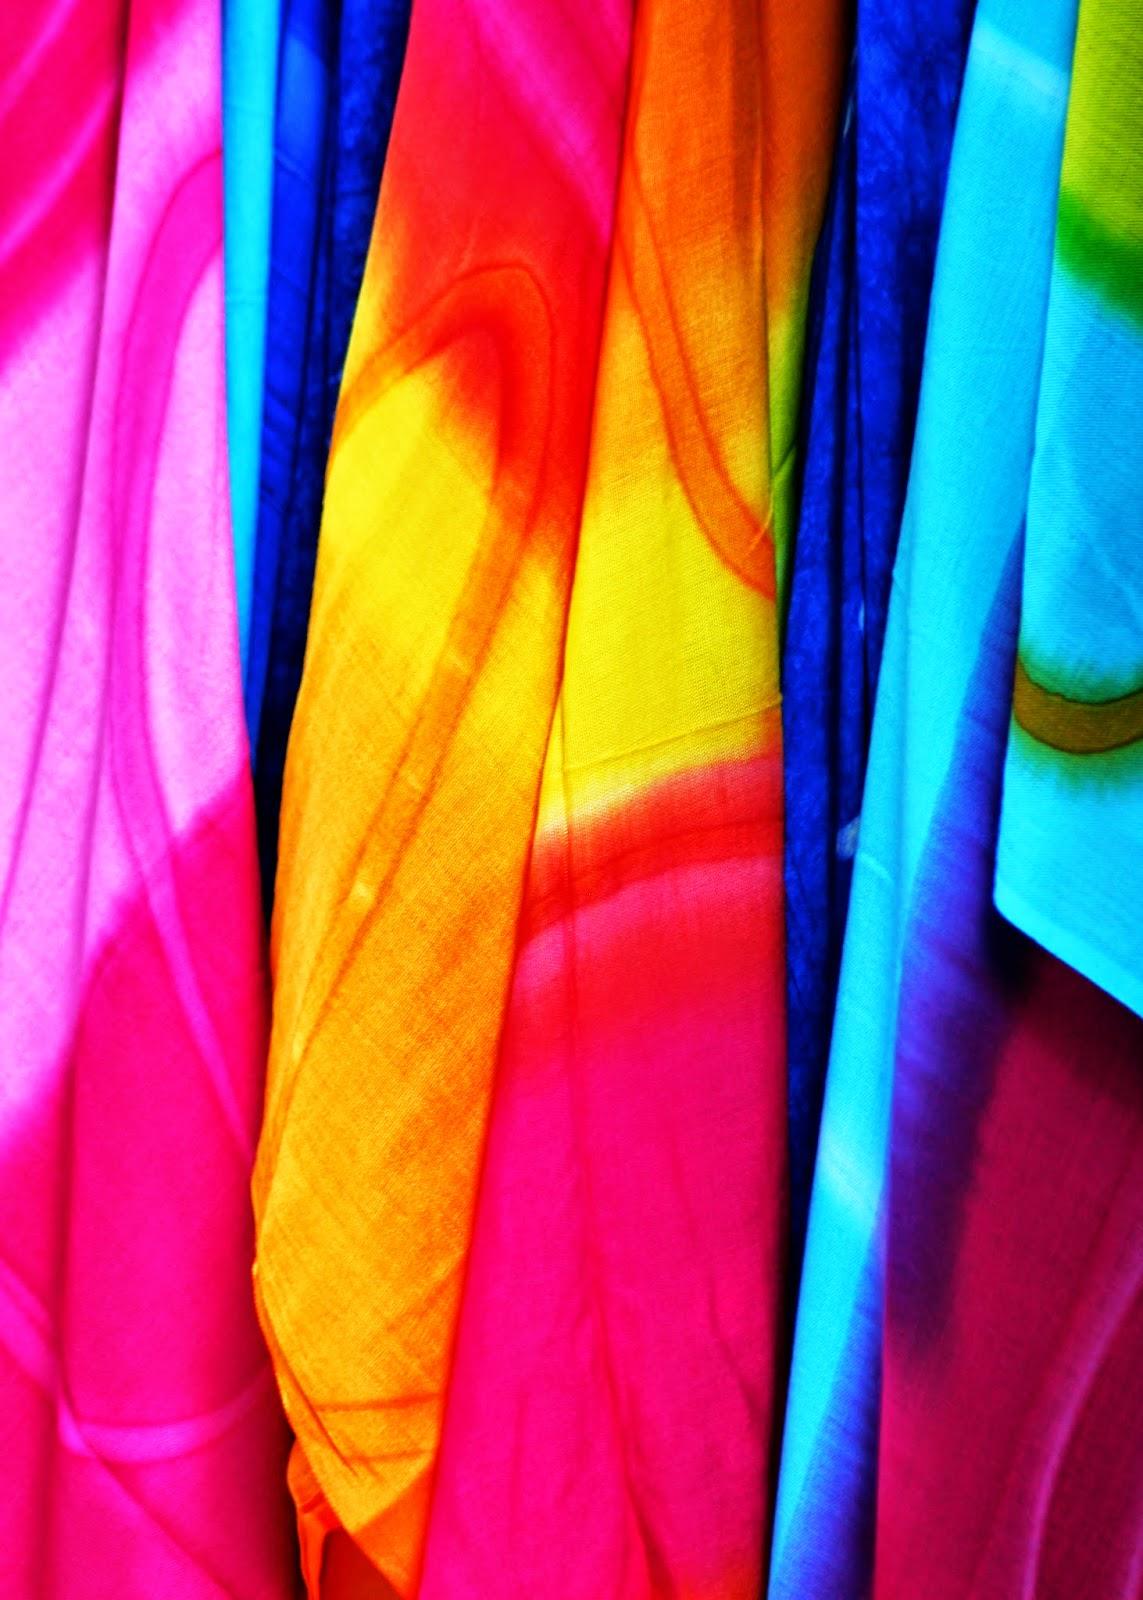 Окрашивание ткани домашних условиях